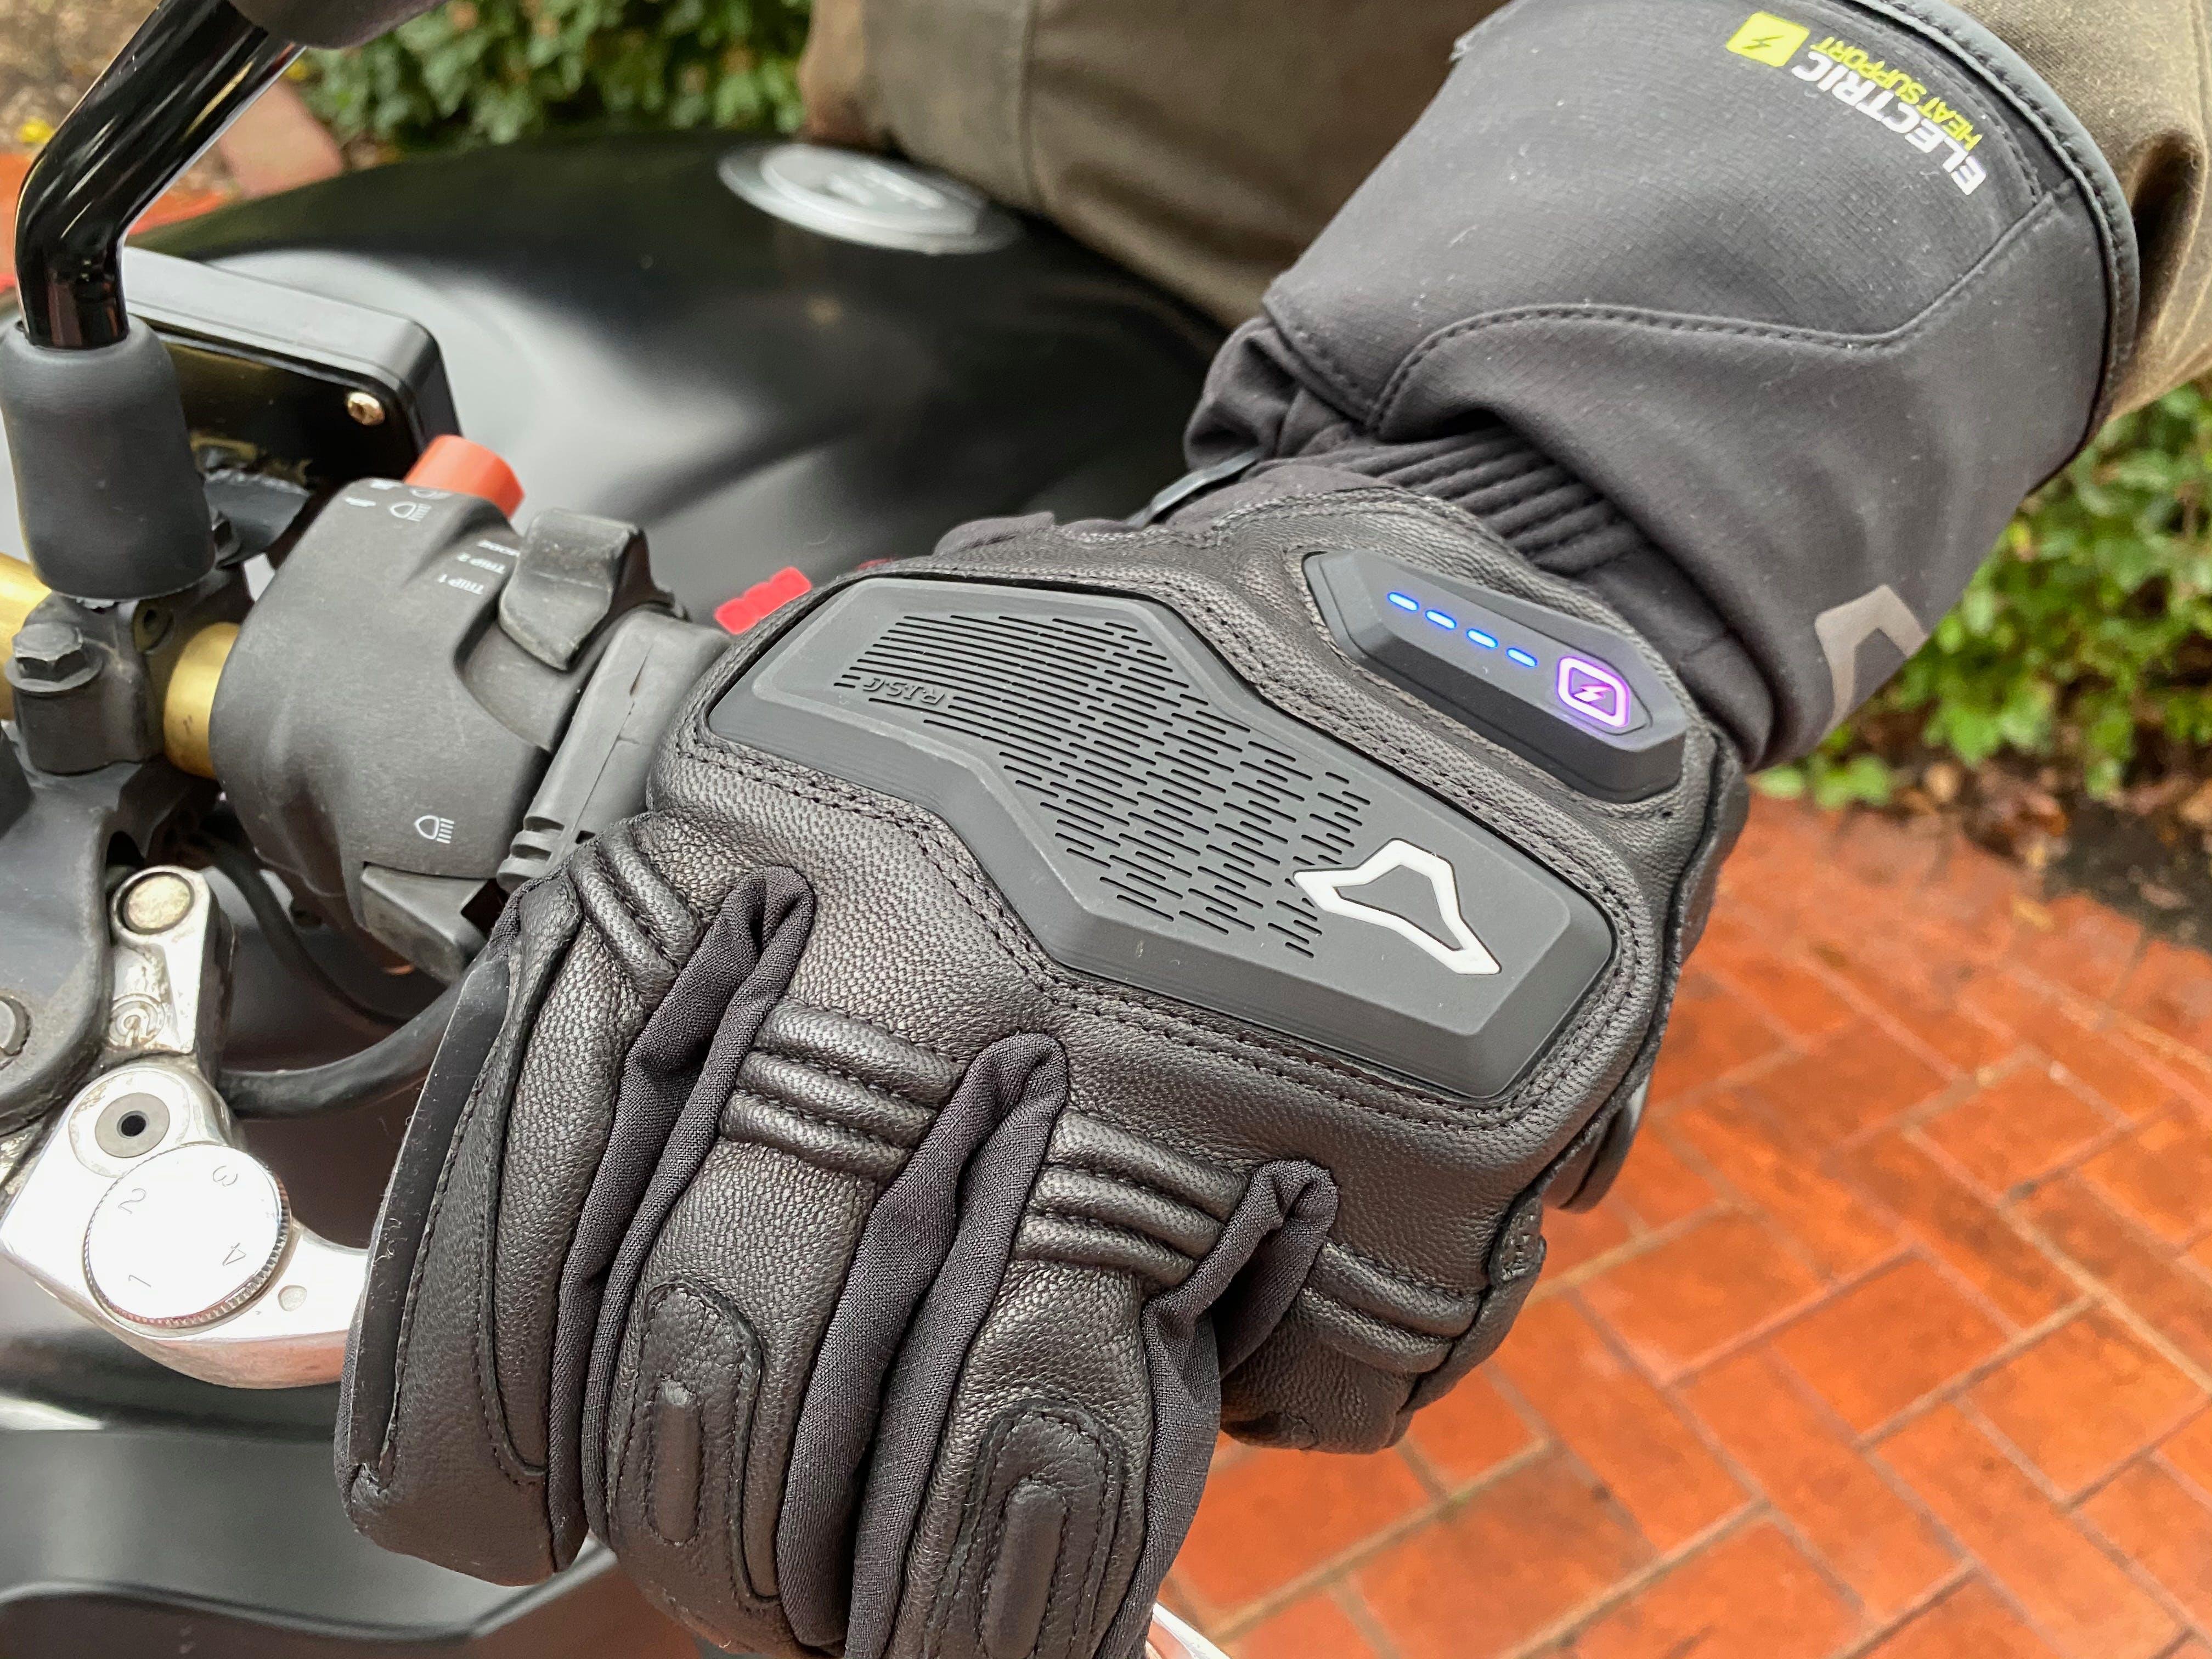 The Macna Ion heated glove on a mans hand on a motorcycle handlebar